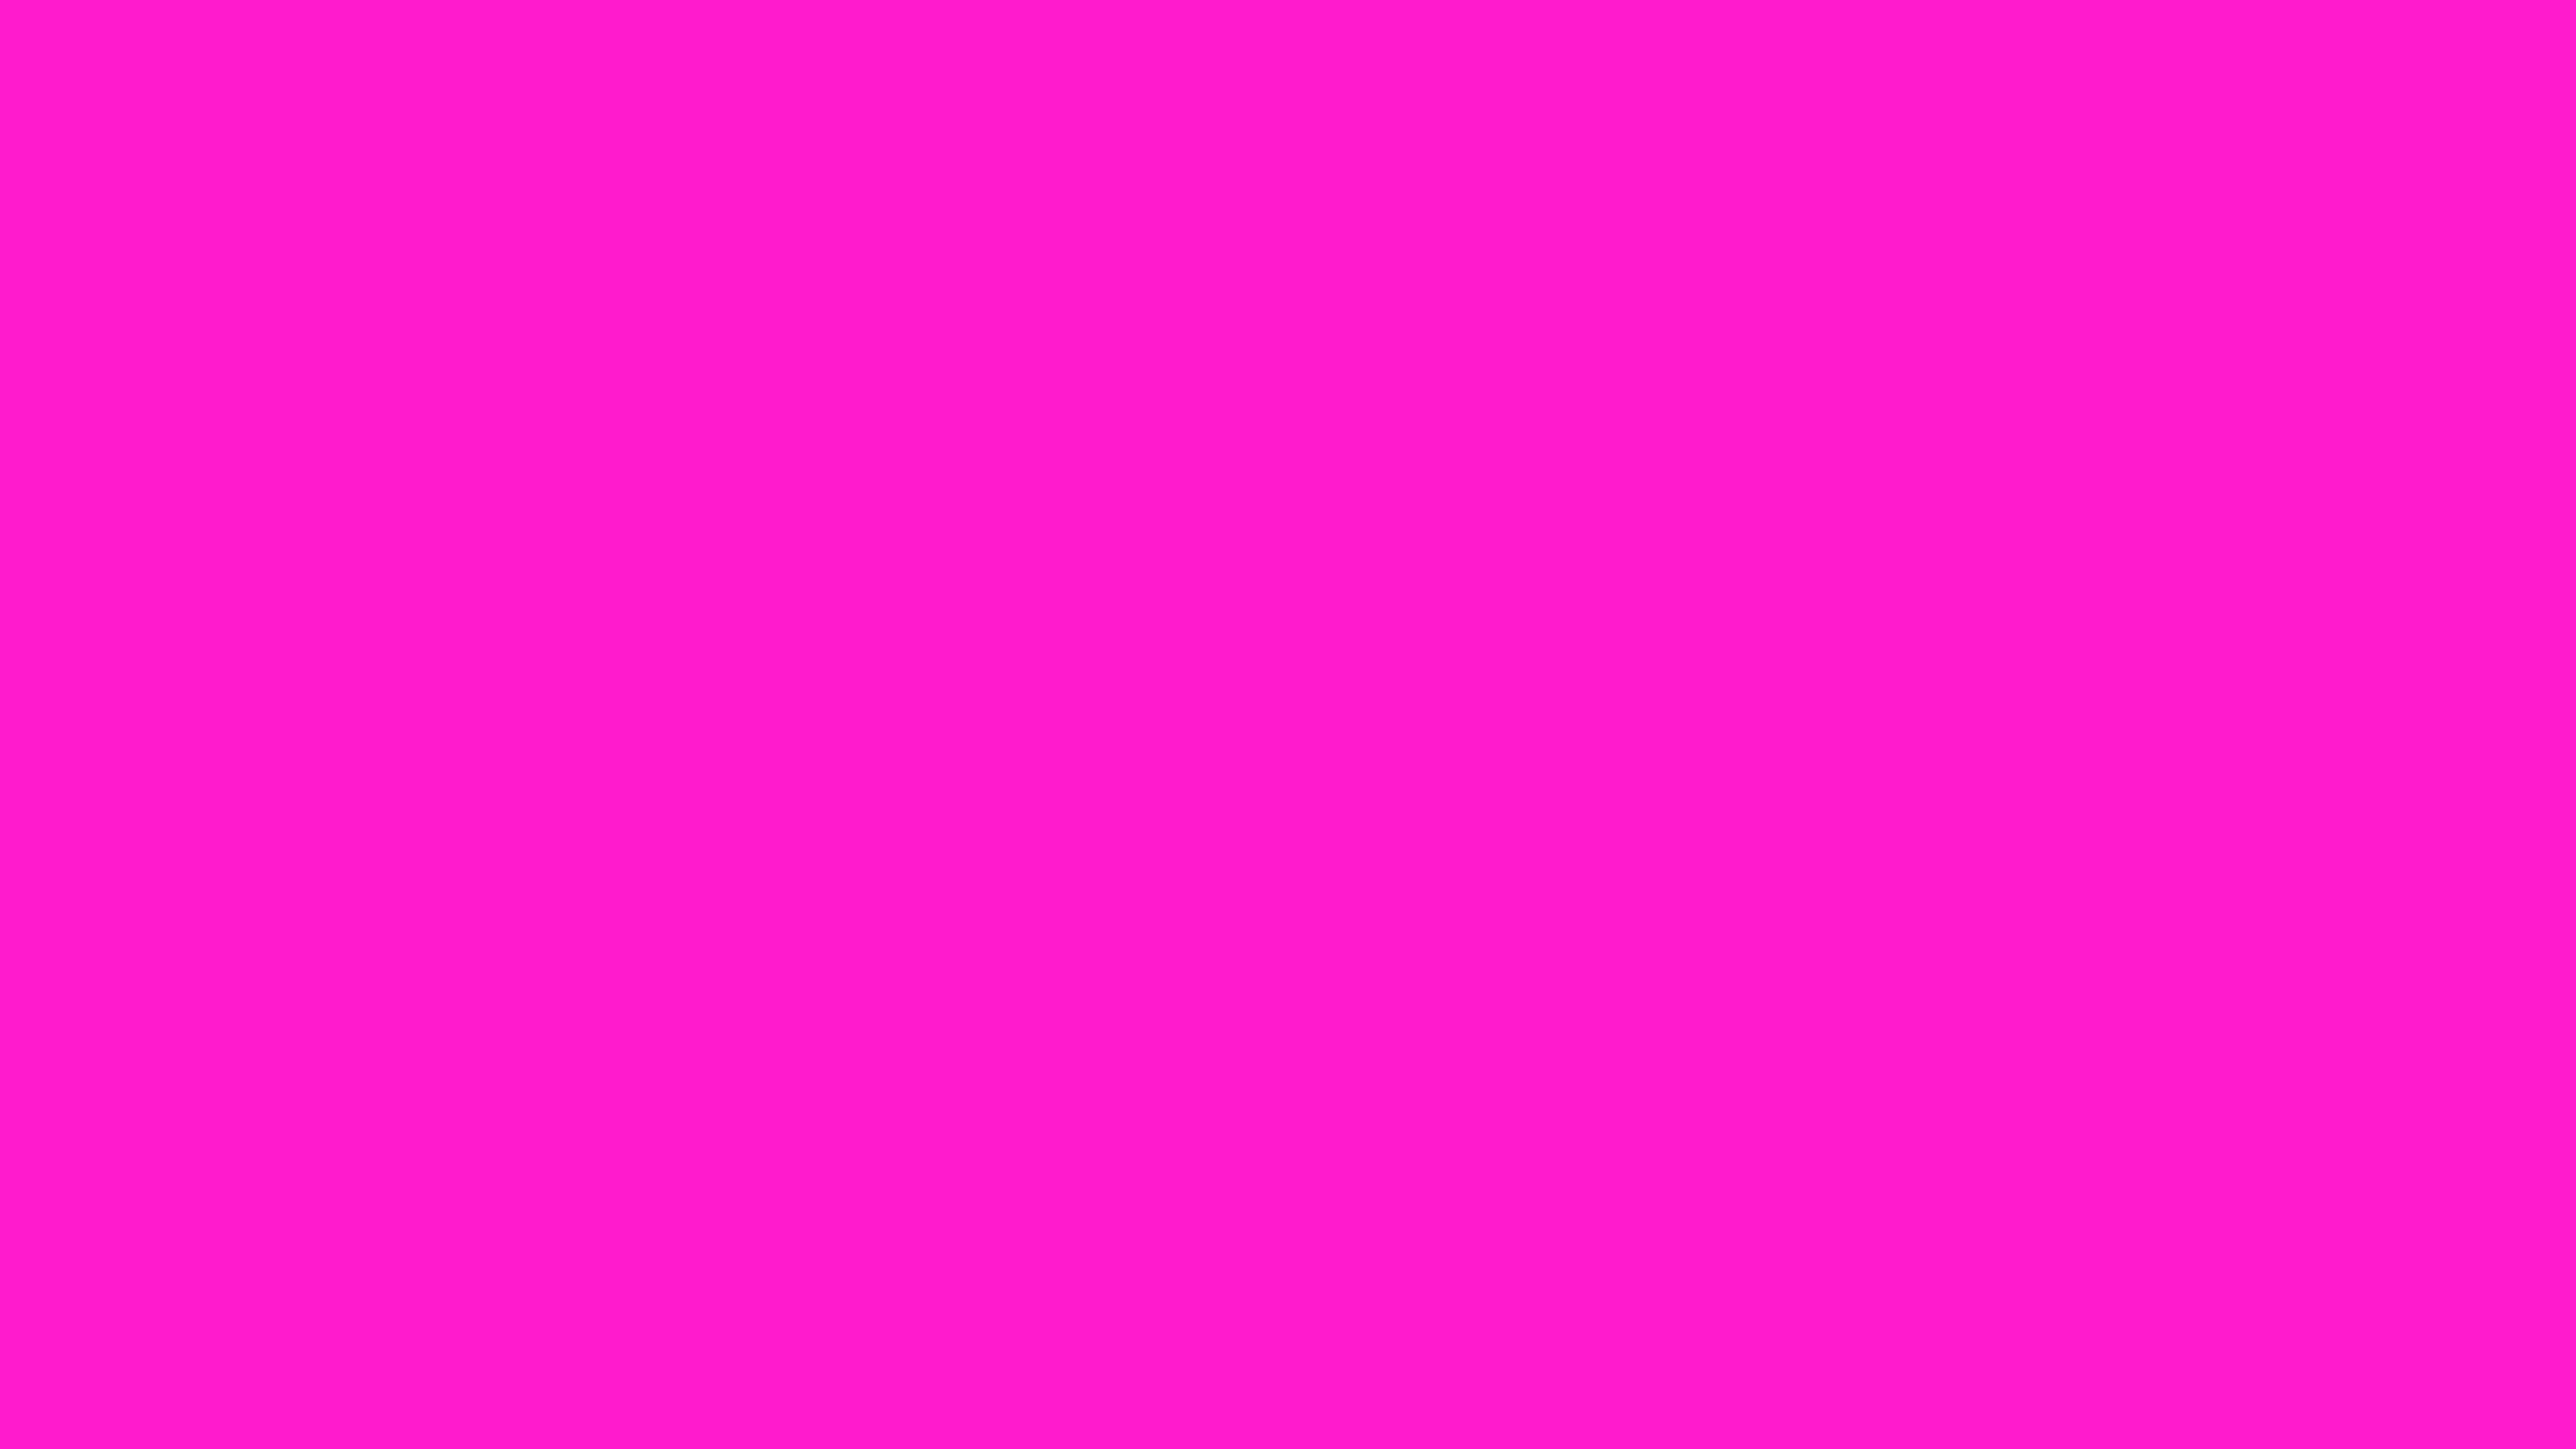 3840x2160 Hot Magenta Solid Color Background